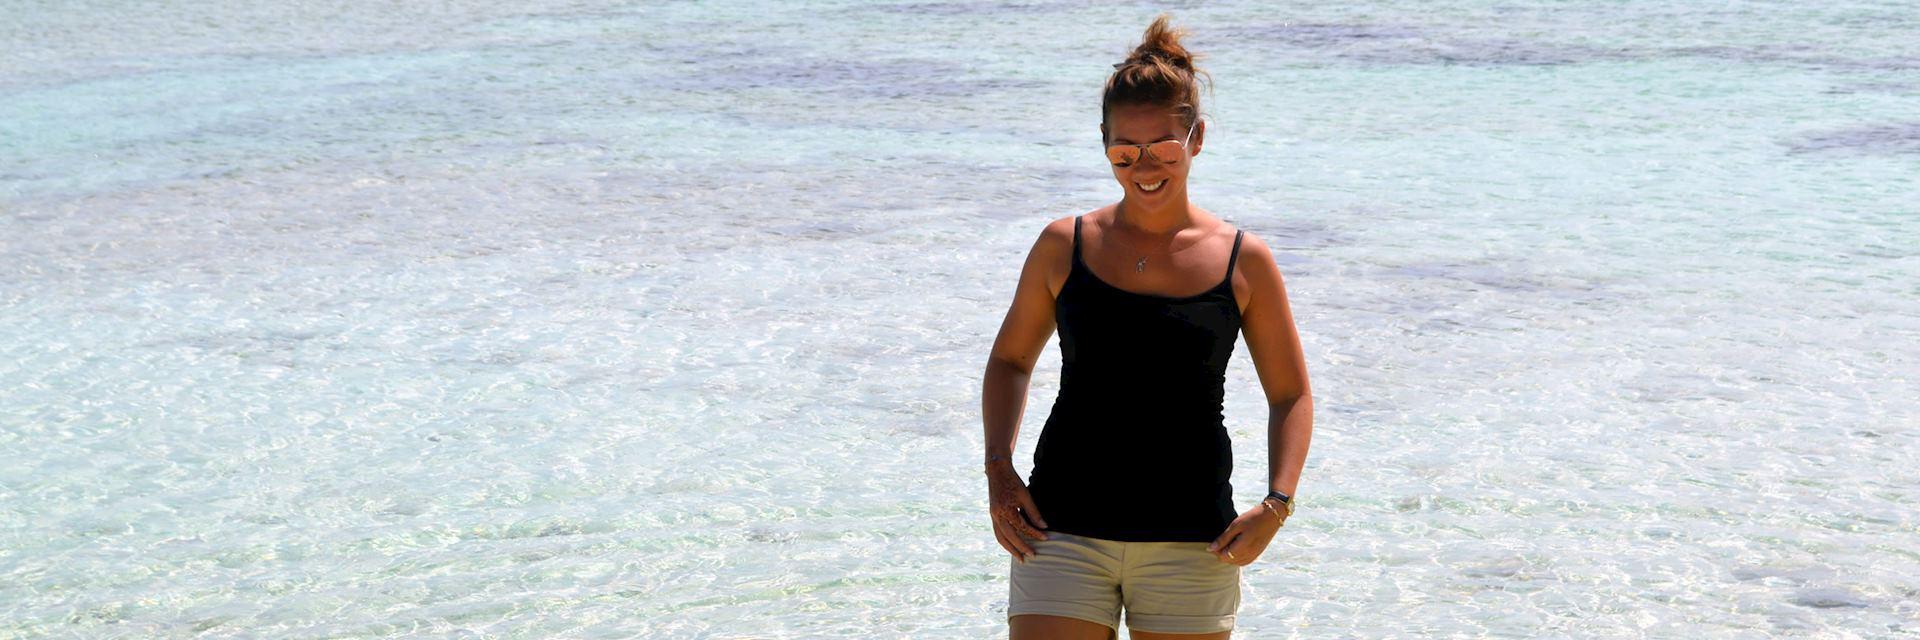 Hannah paddling on Dennis Island, Seychelles